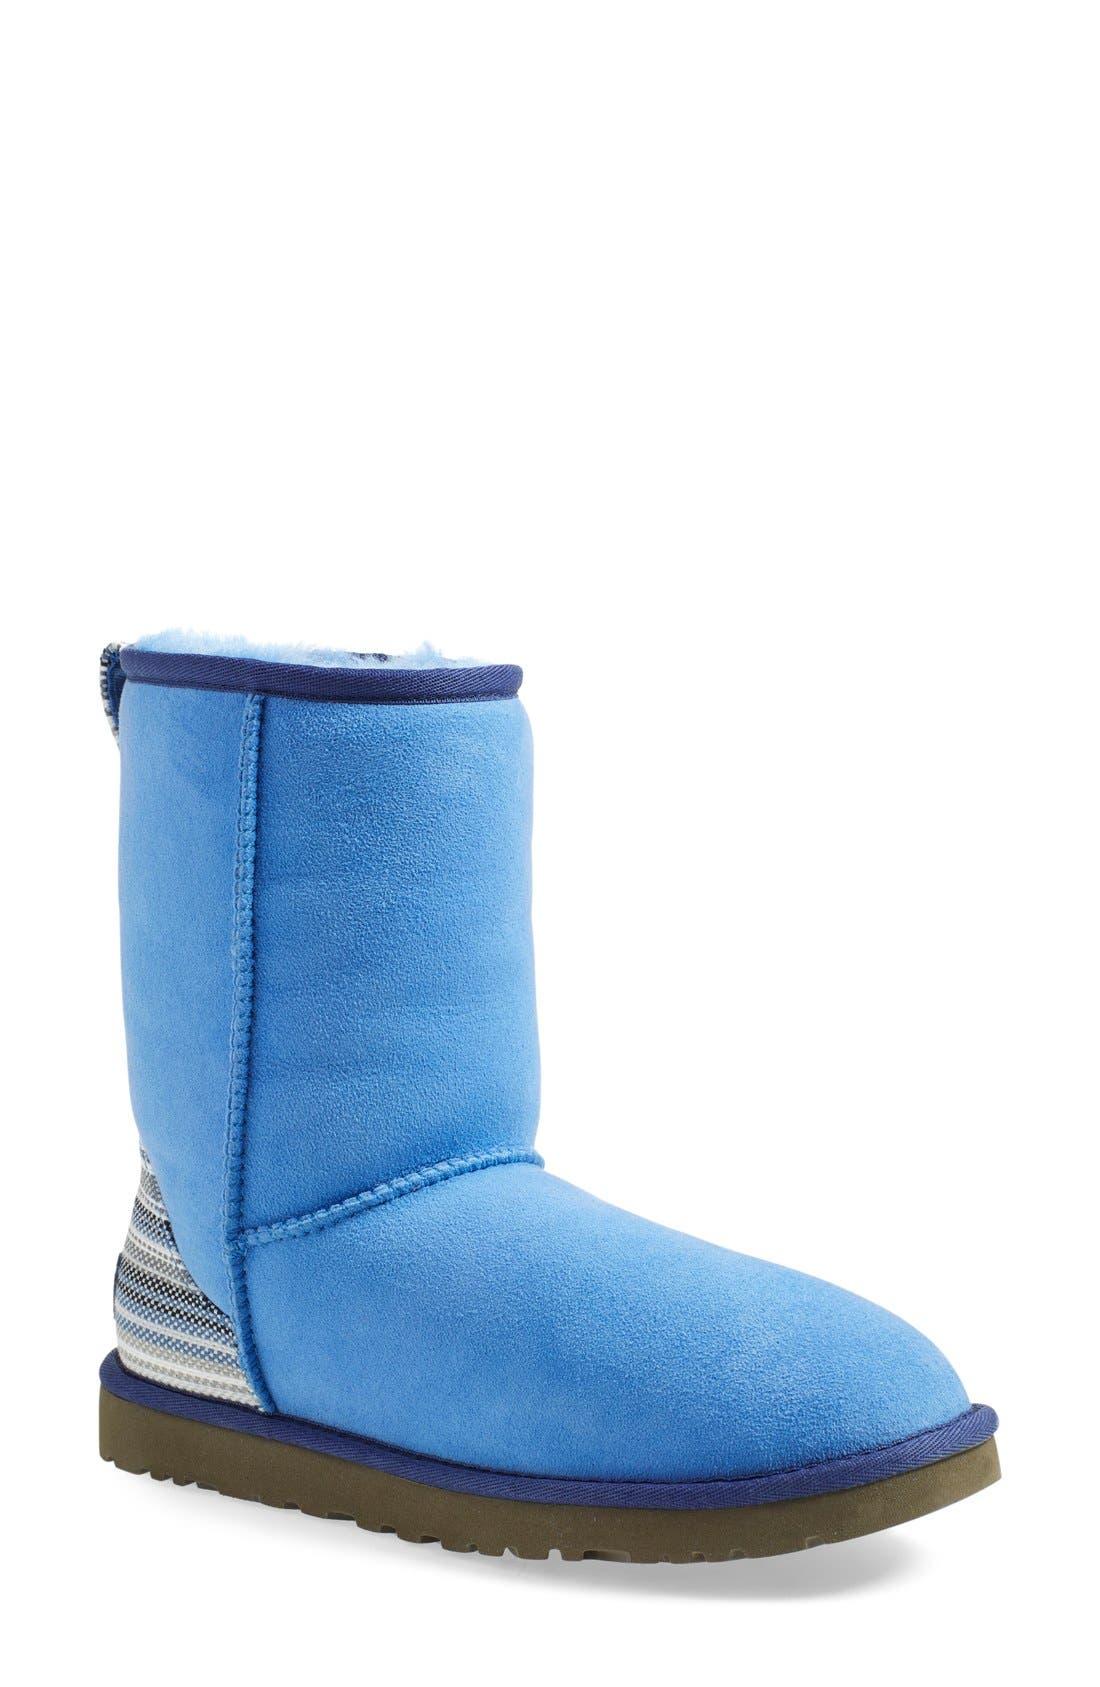 Alternate Image 1 Selected - UGG® 'Classic Short - Serape' Water Resistant Boot (Women)